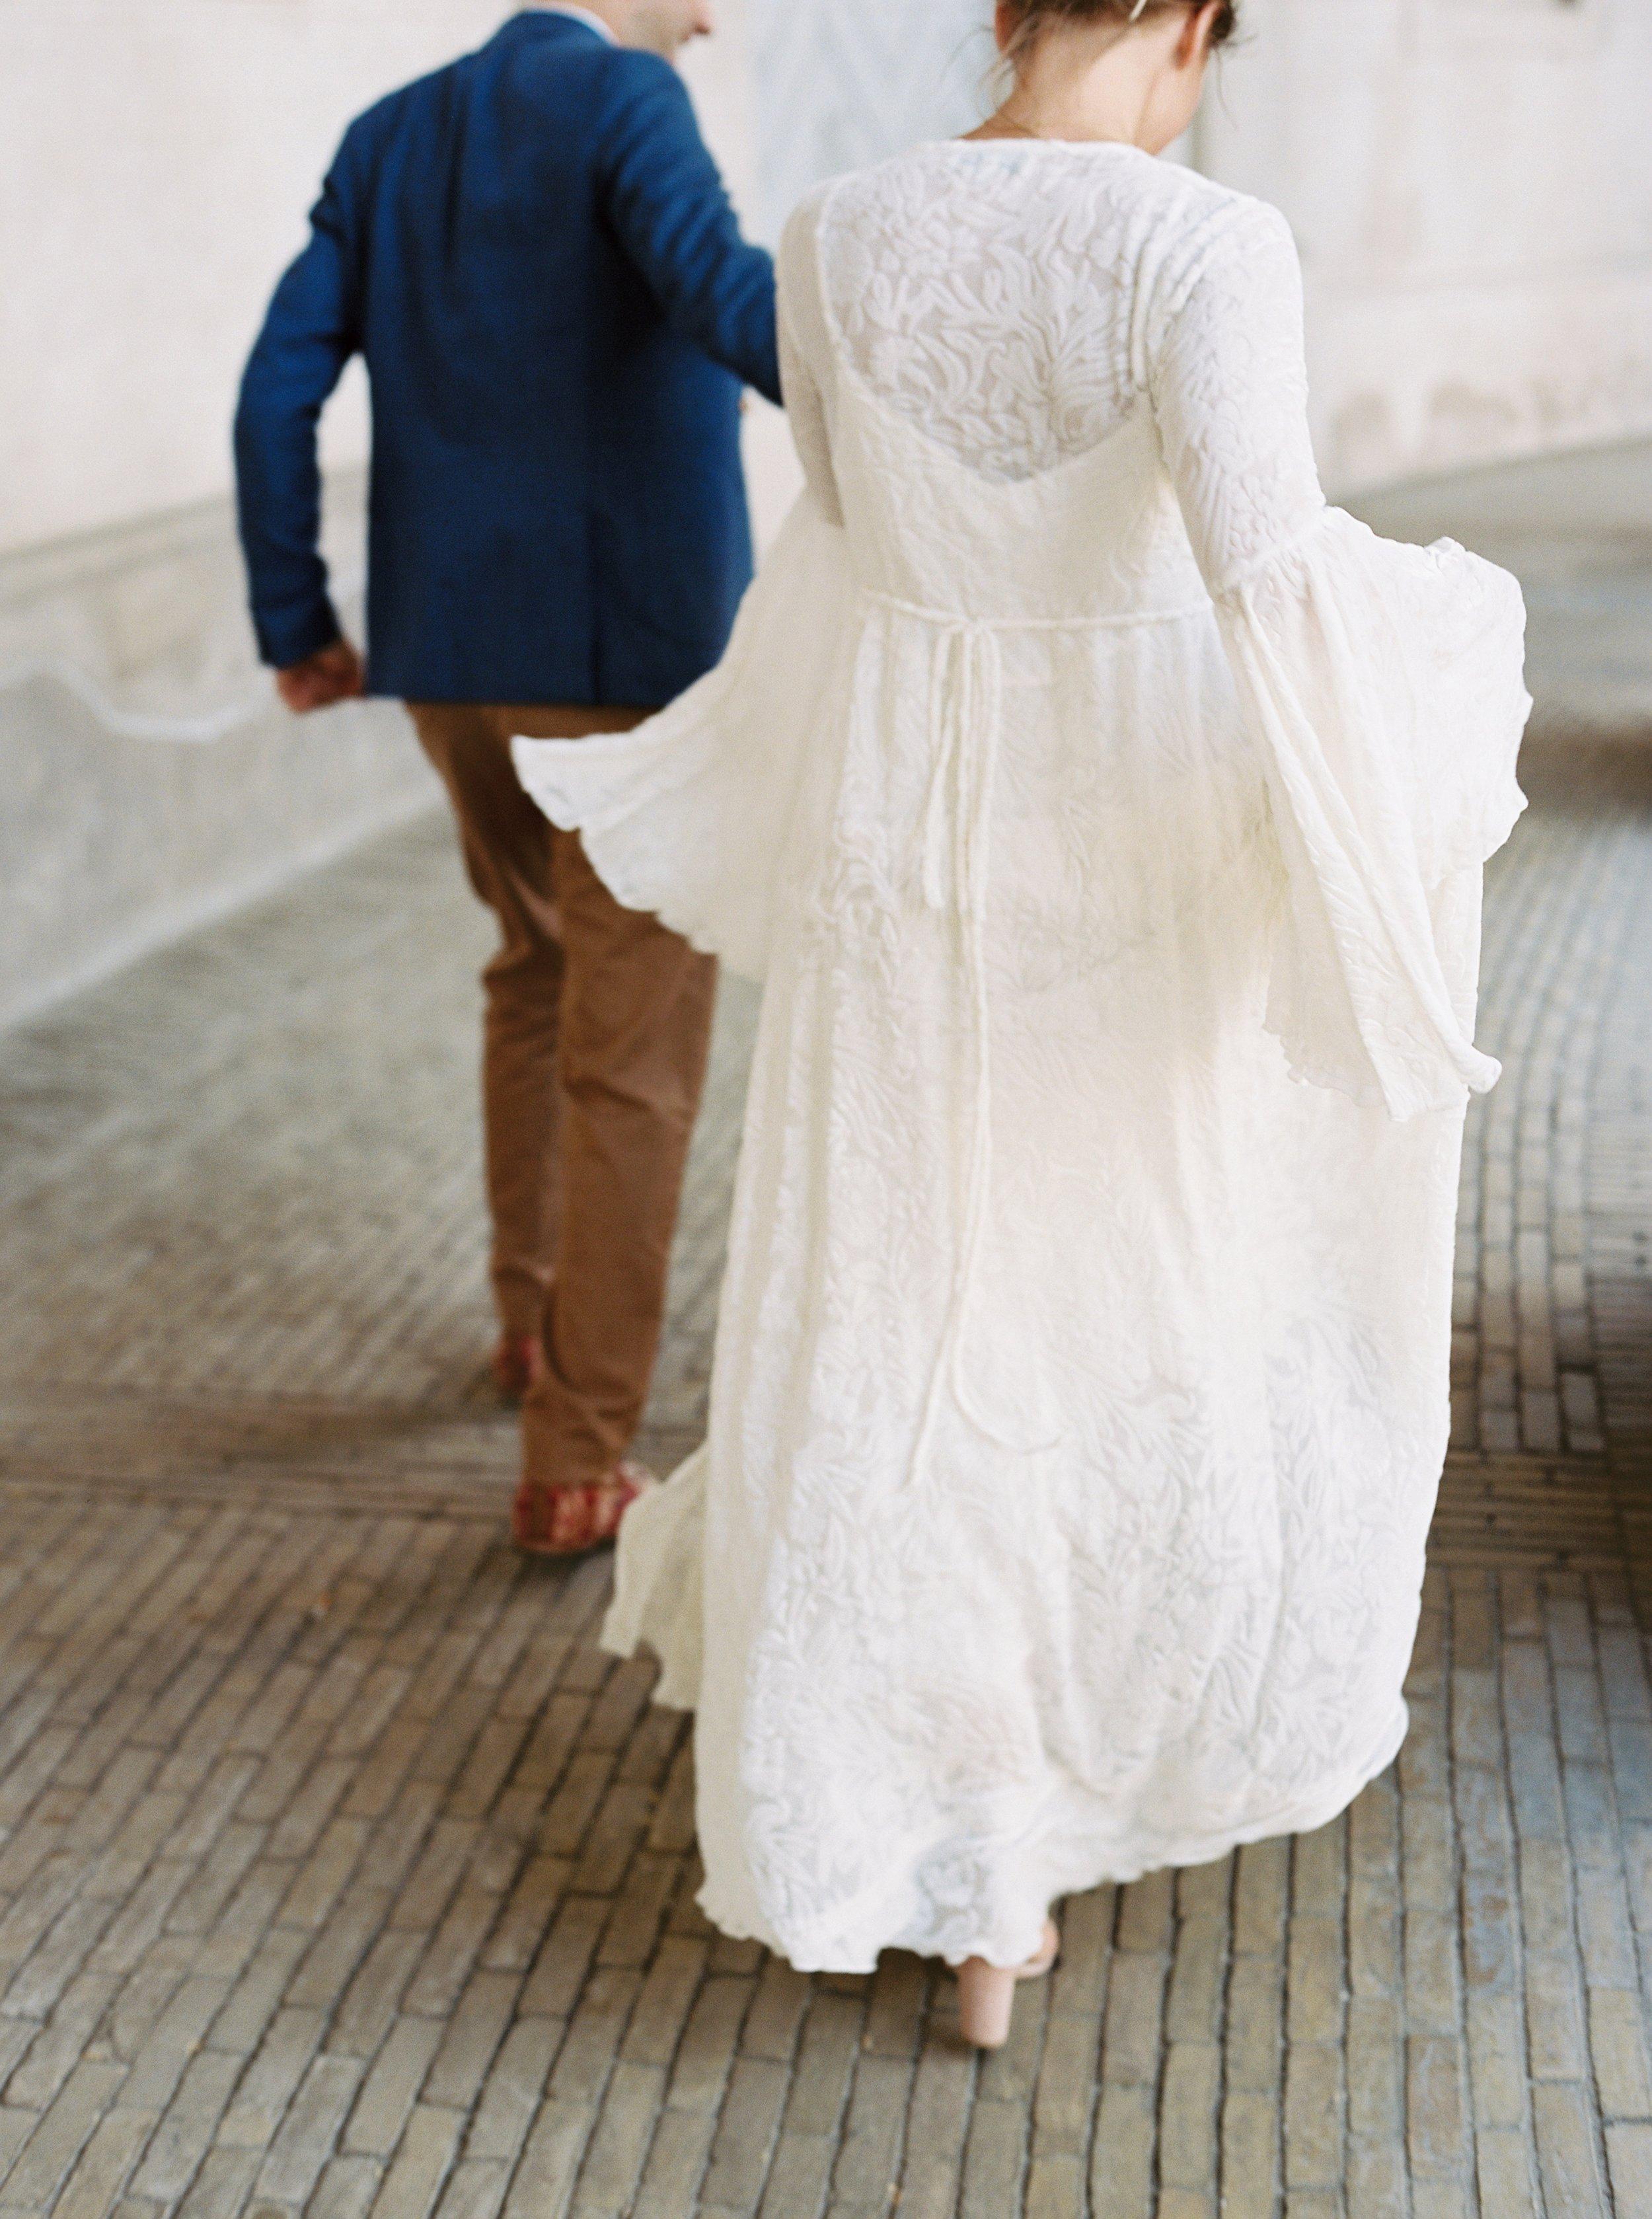 Kyle John l Fine Art Wedding Photography l Chicago, Copenhagen, California, New York, Destination l Blog l Alexis and Zach_Copenhagen Part 2_2